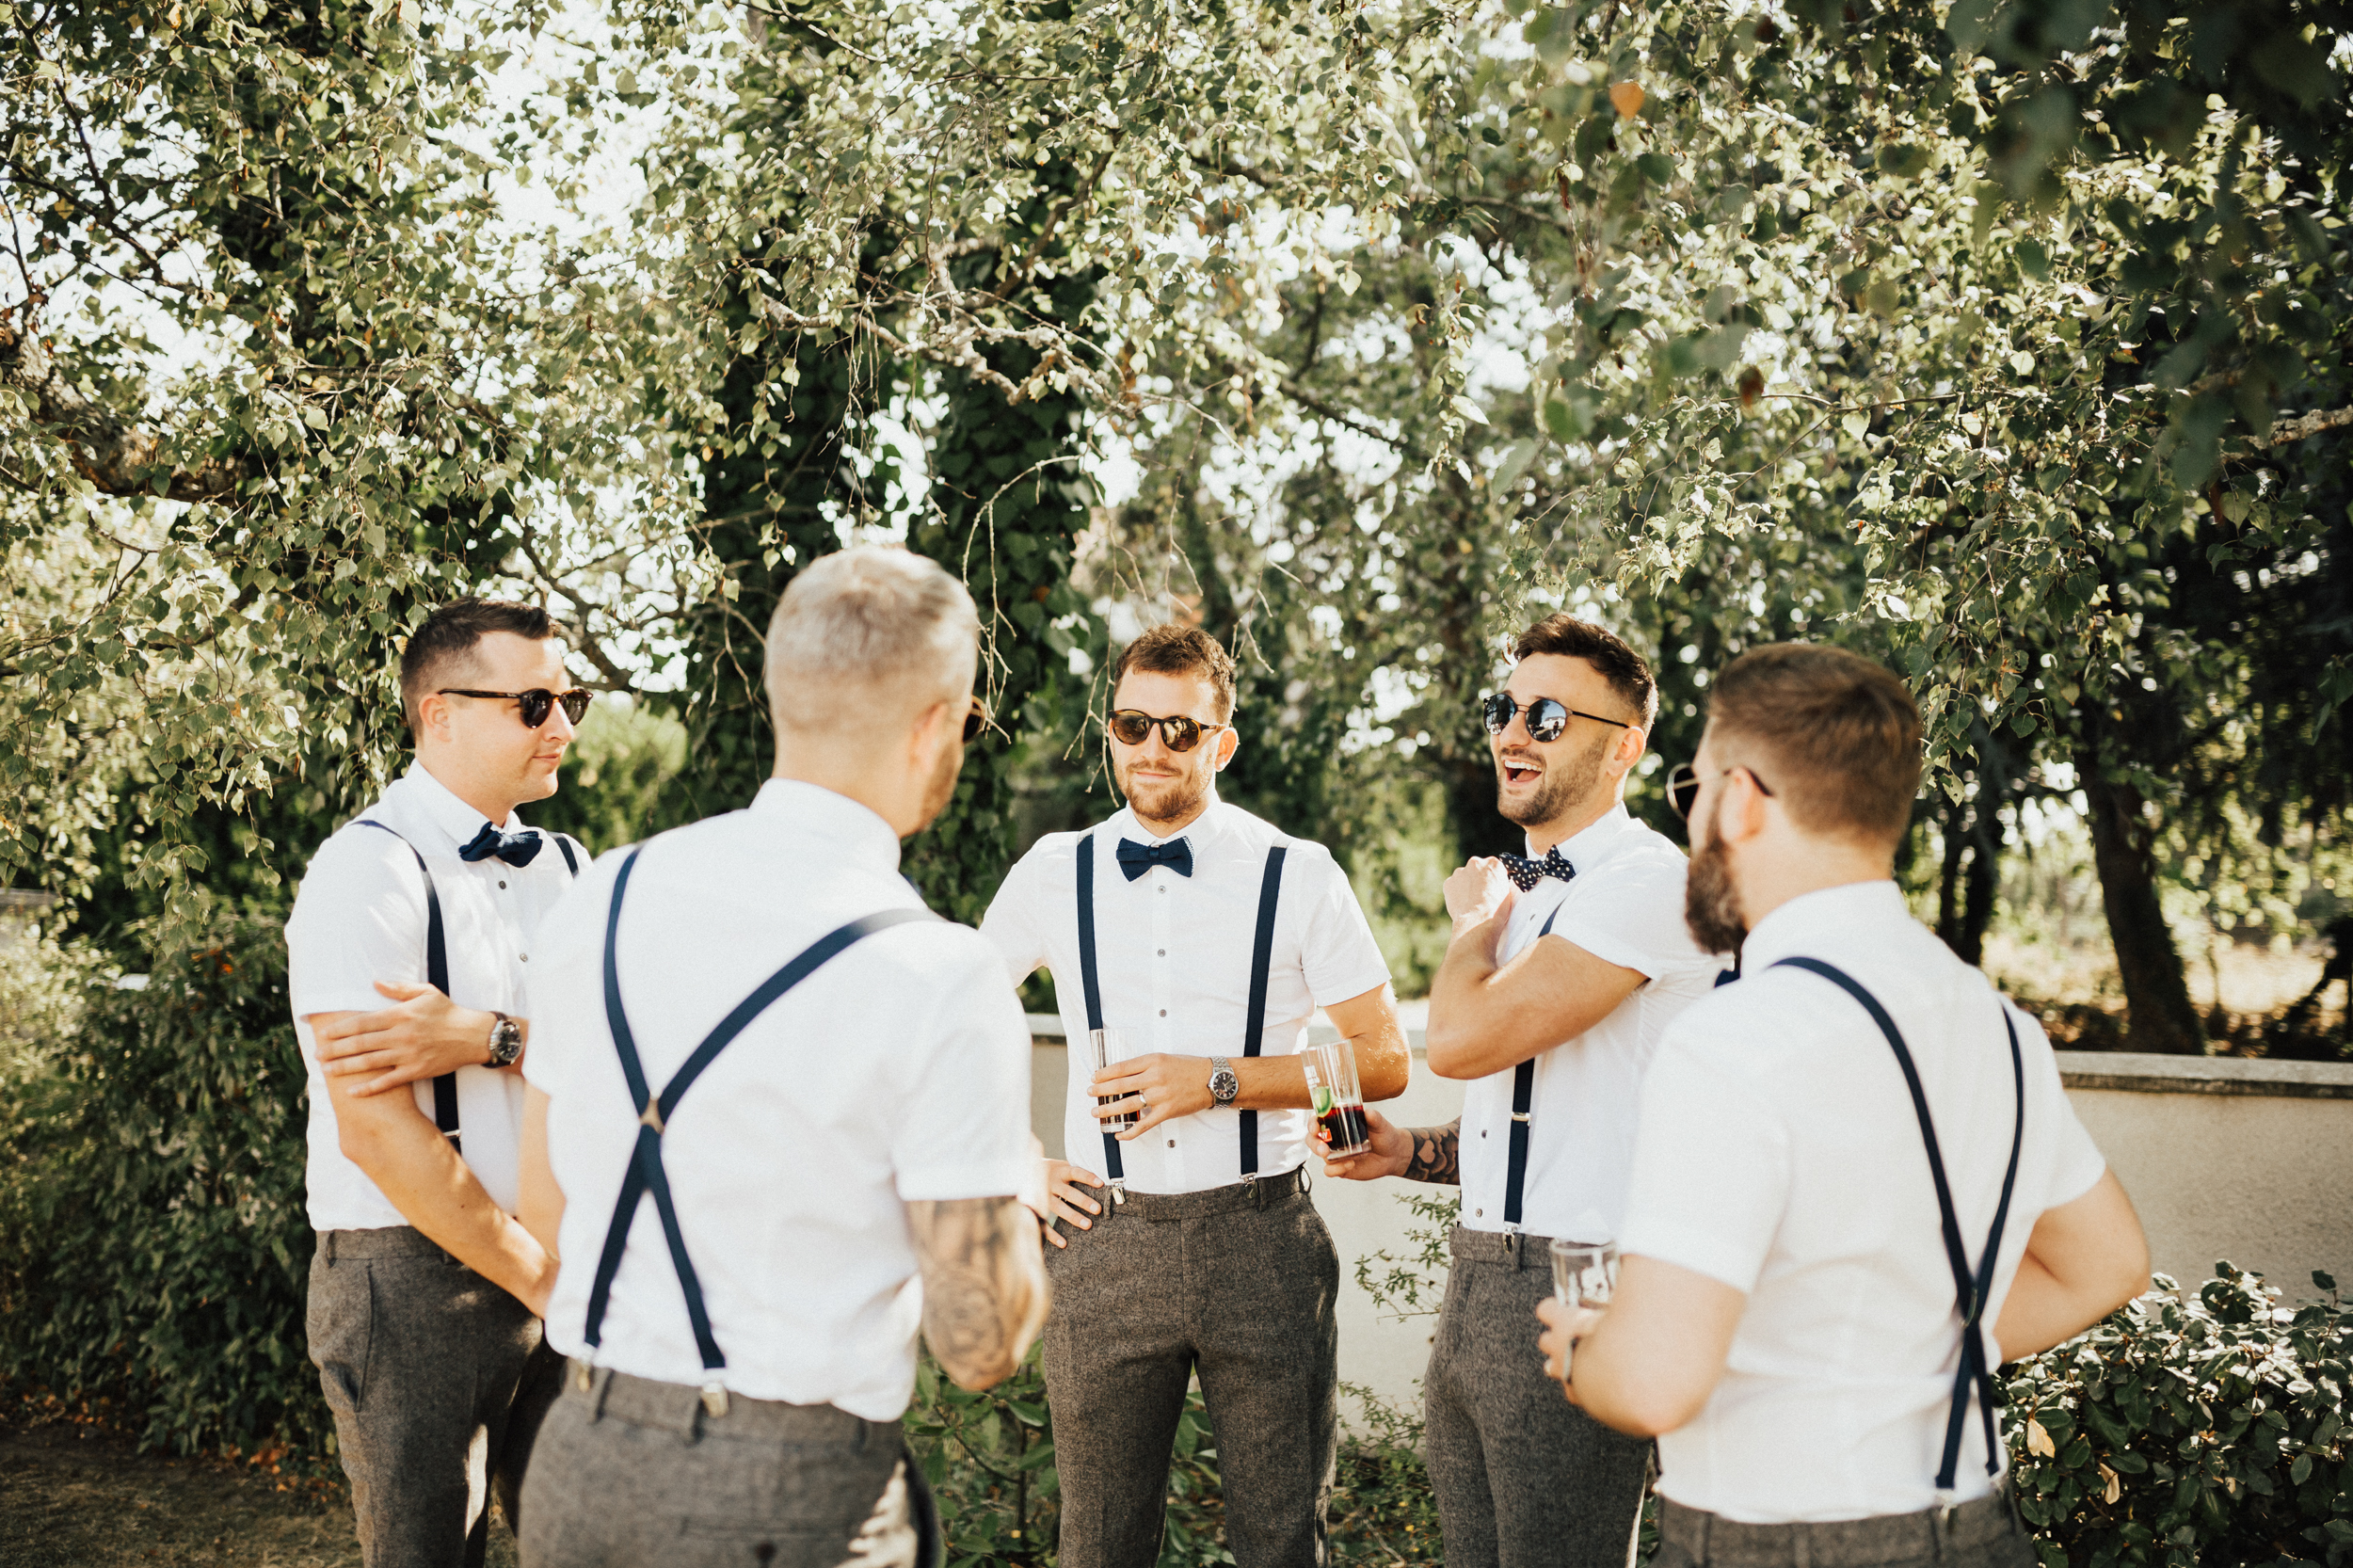 Amy-Zac-Destination-Wedding-France-Manoir-Foulquetiere-Darina-Stoda-Photography-15.jpg